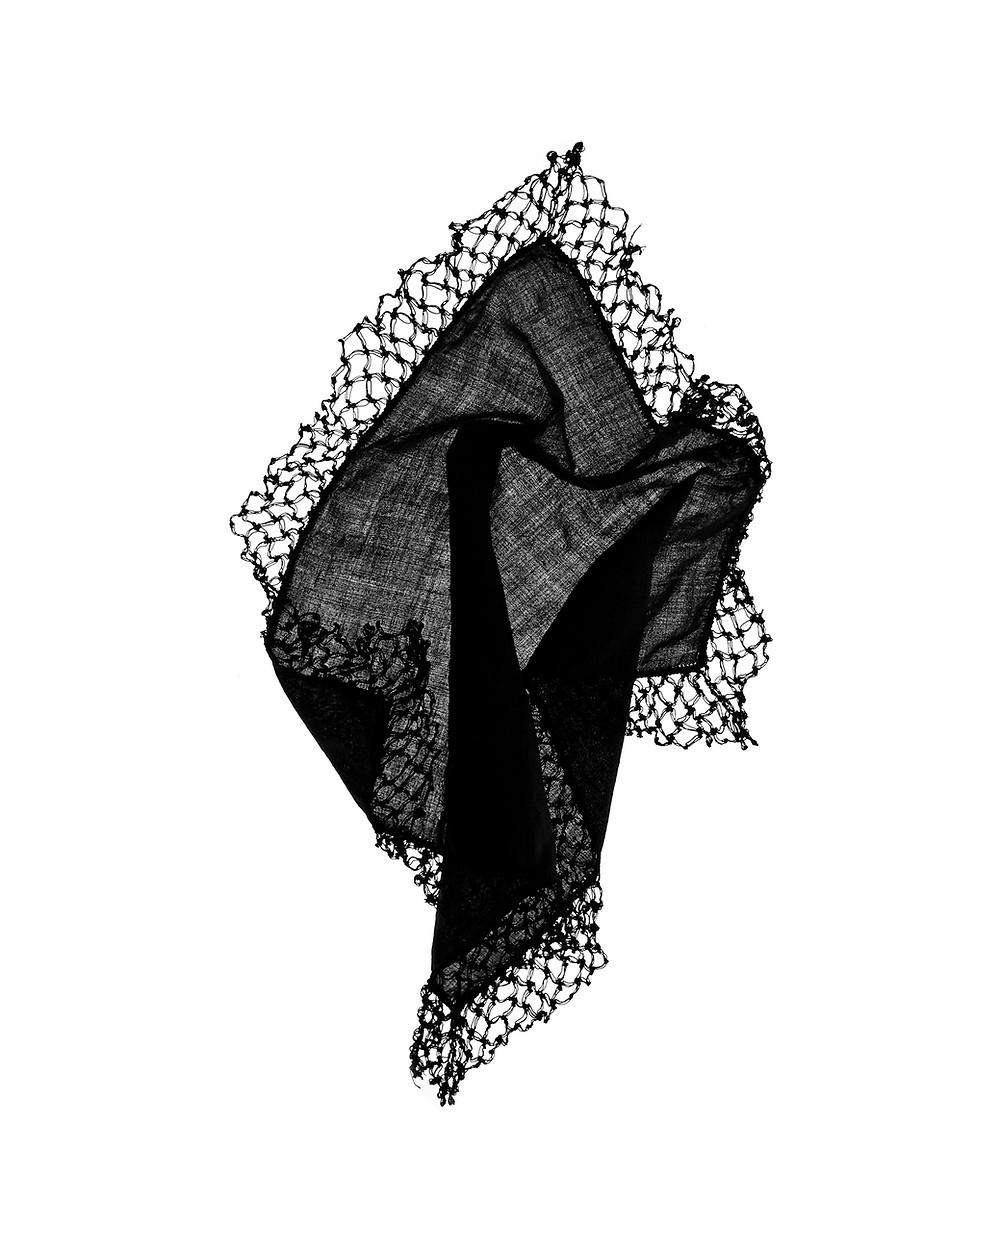 Raymond E. Mingst, Untitled (Mourning Handkerchiefs) 2020